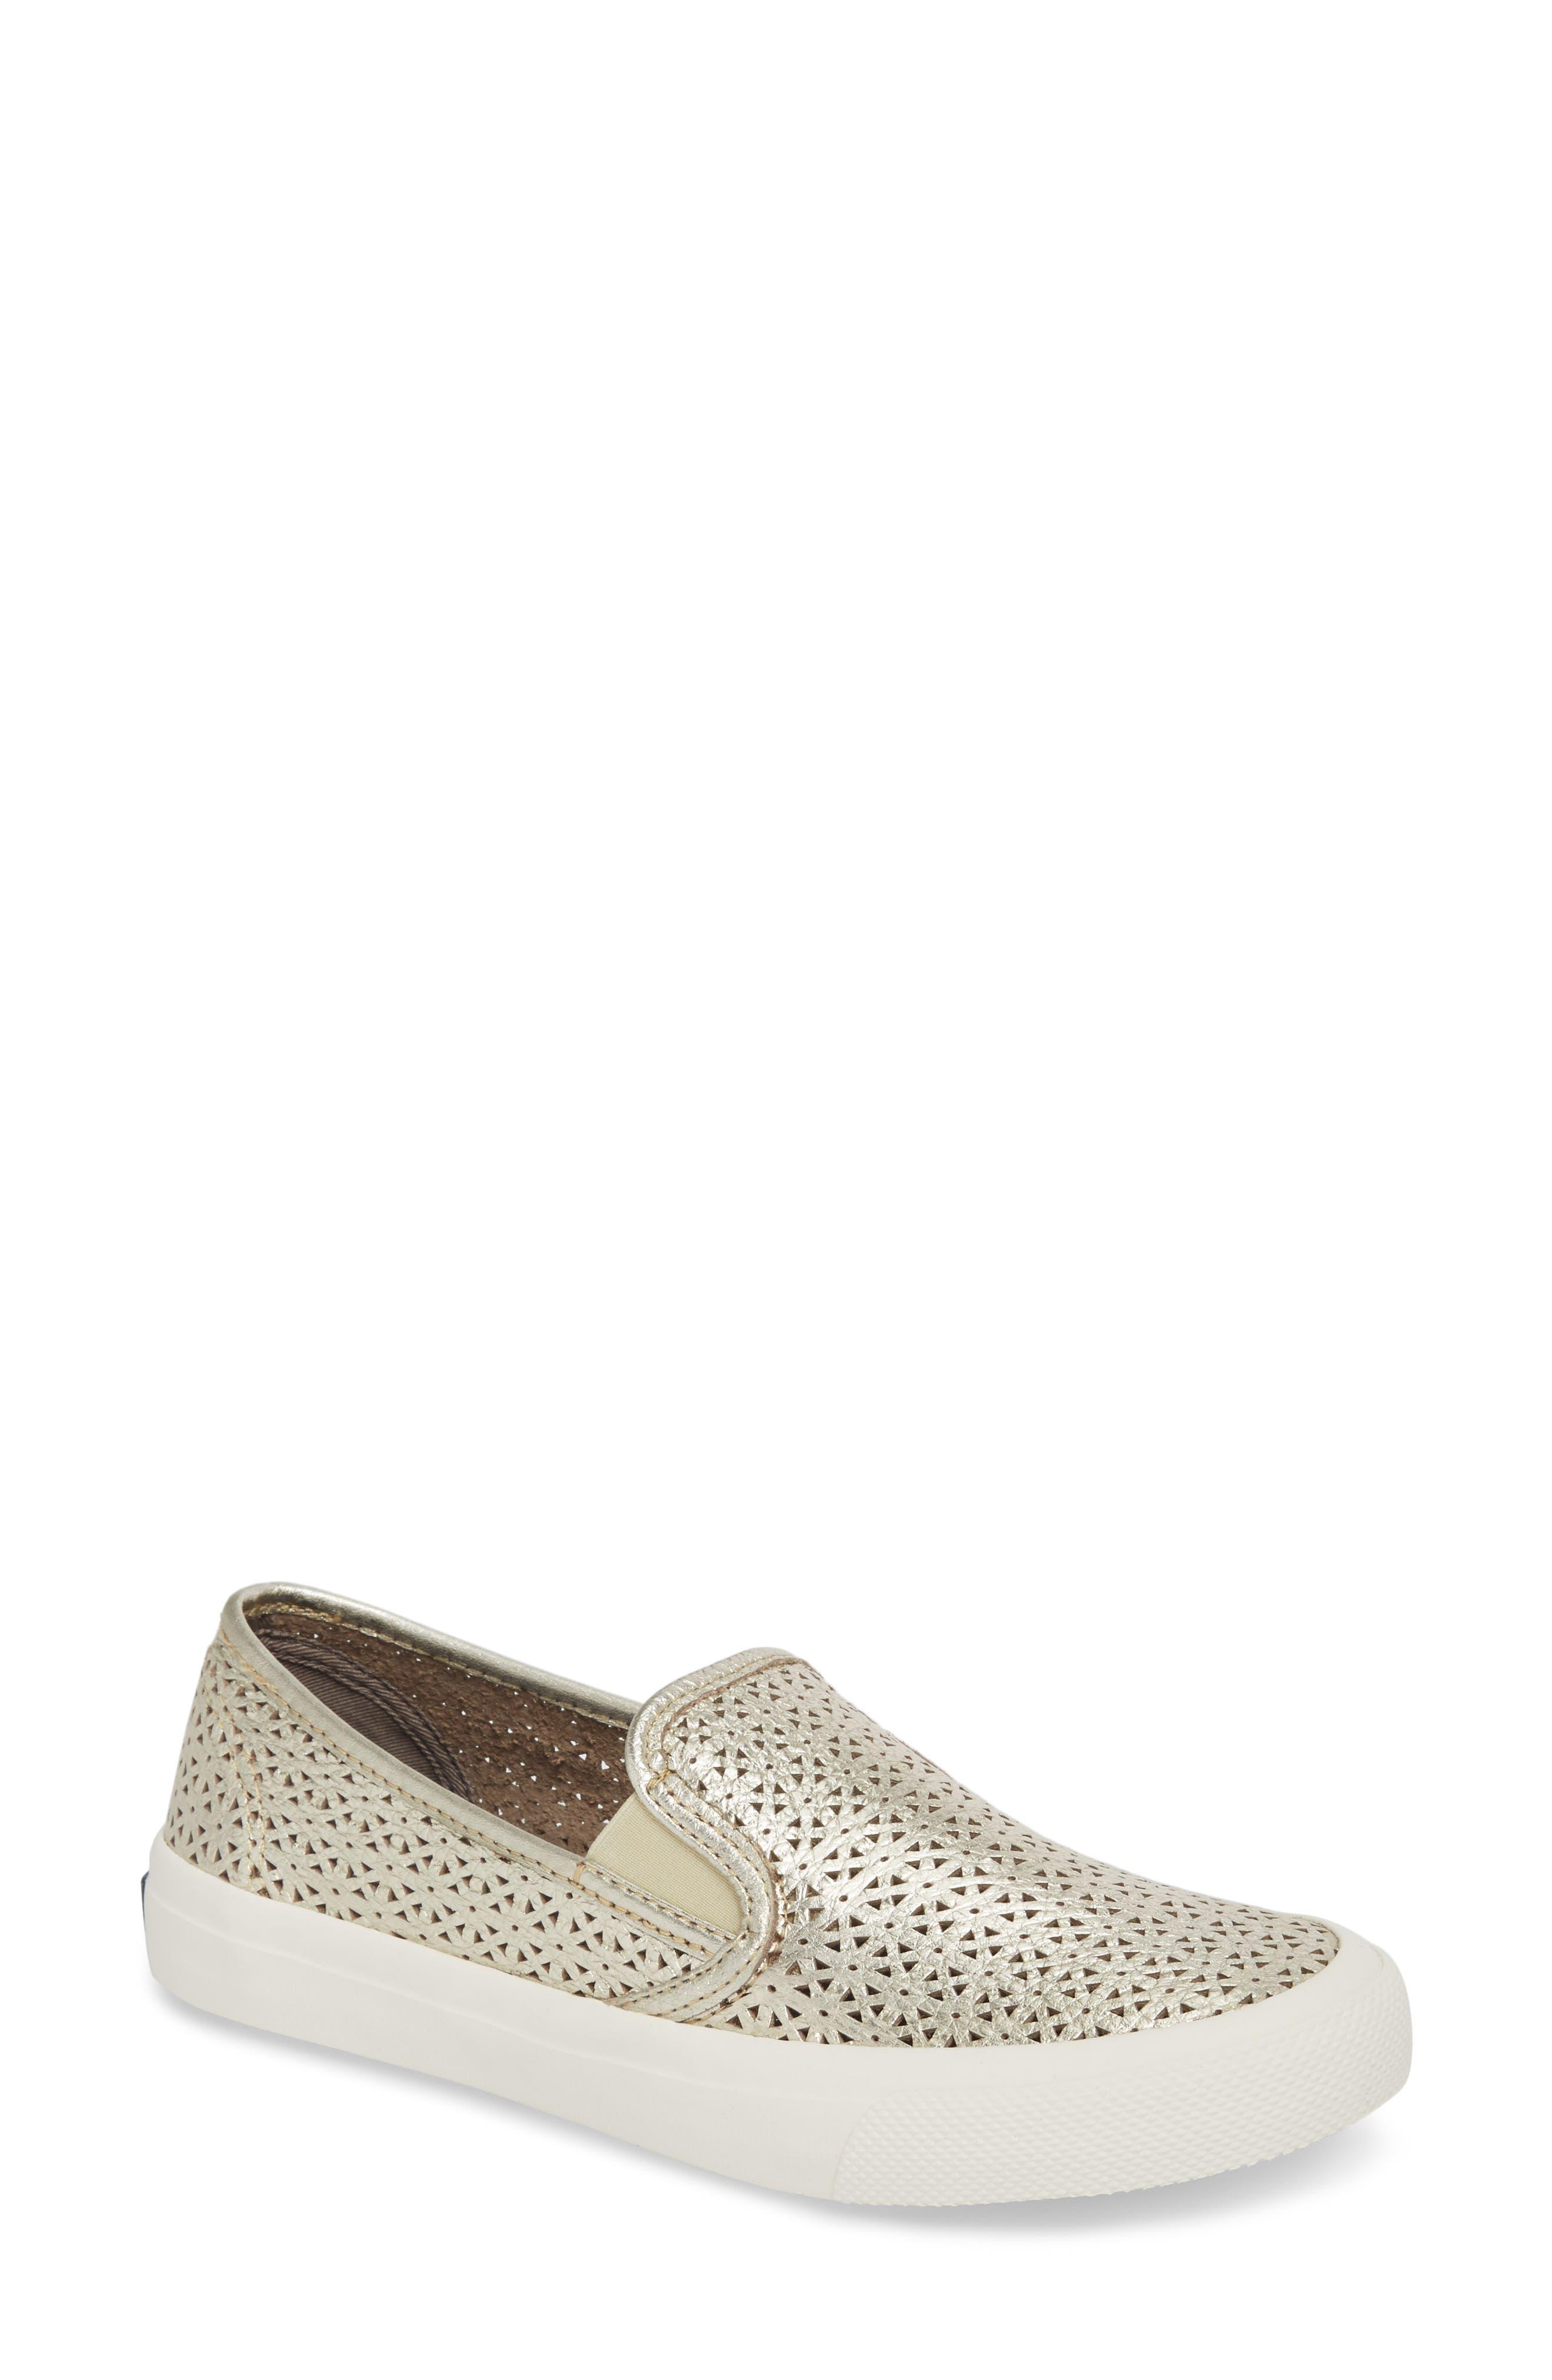 Sperry Seaside Nautical Perforated Slip-On Sneaker (Women)